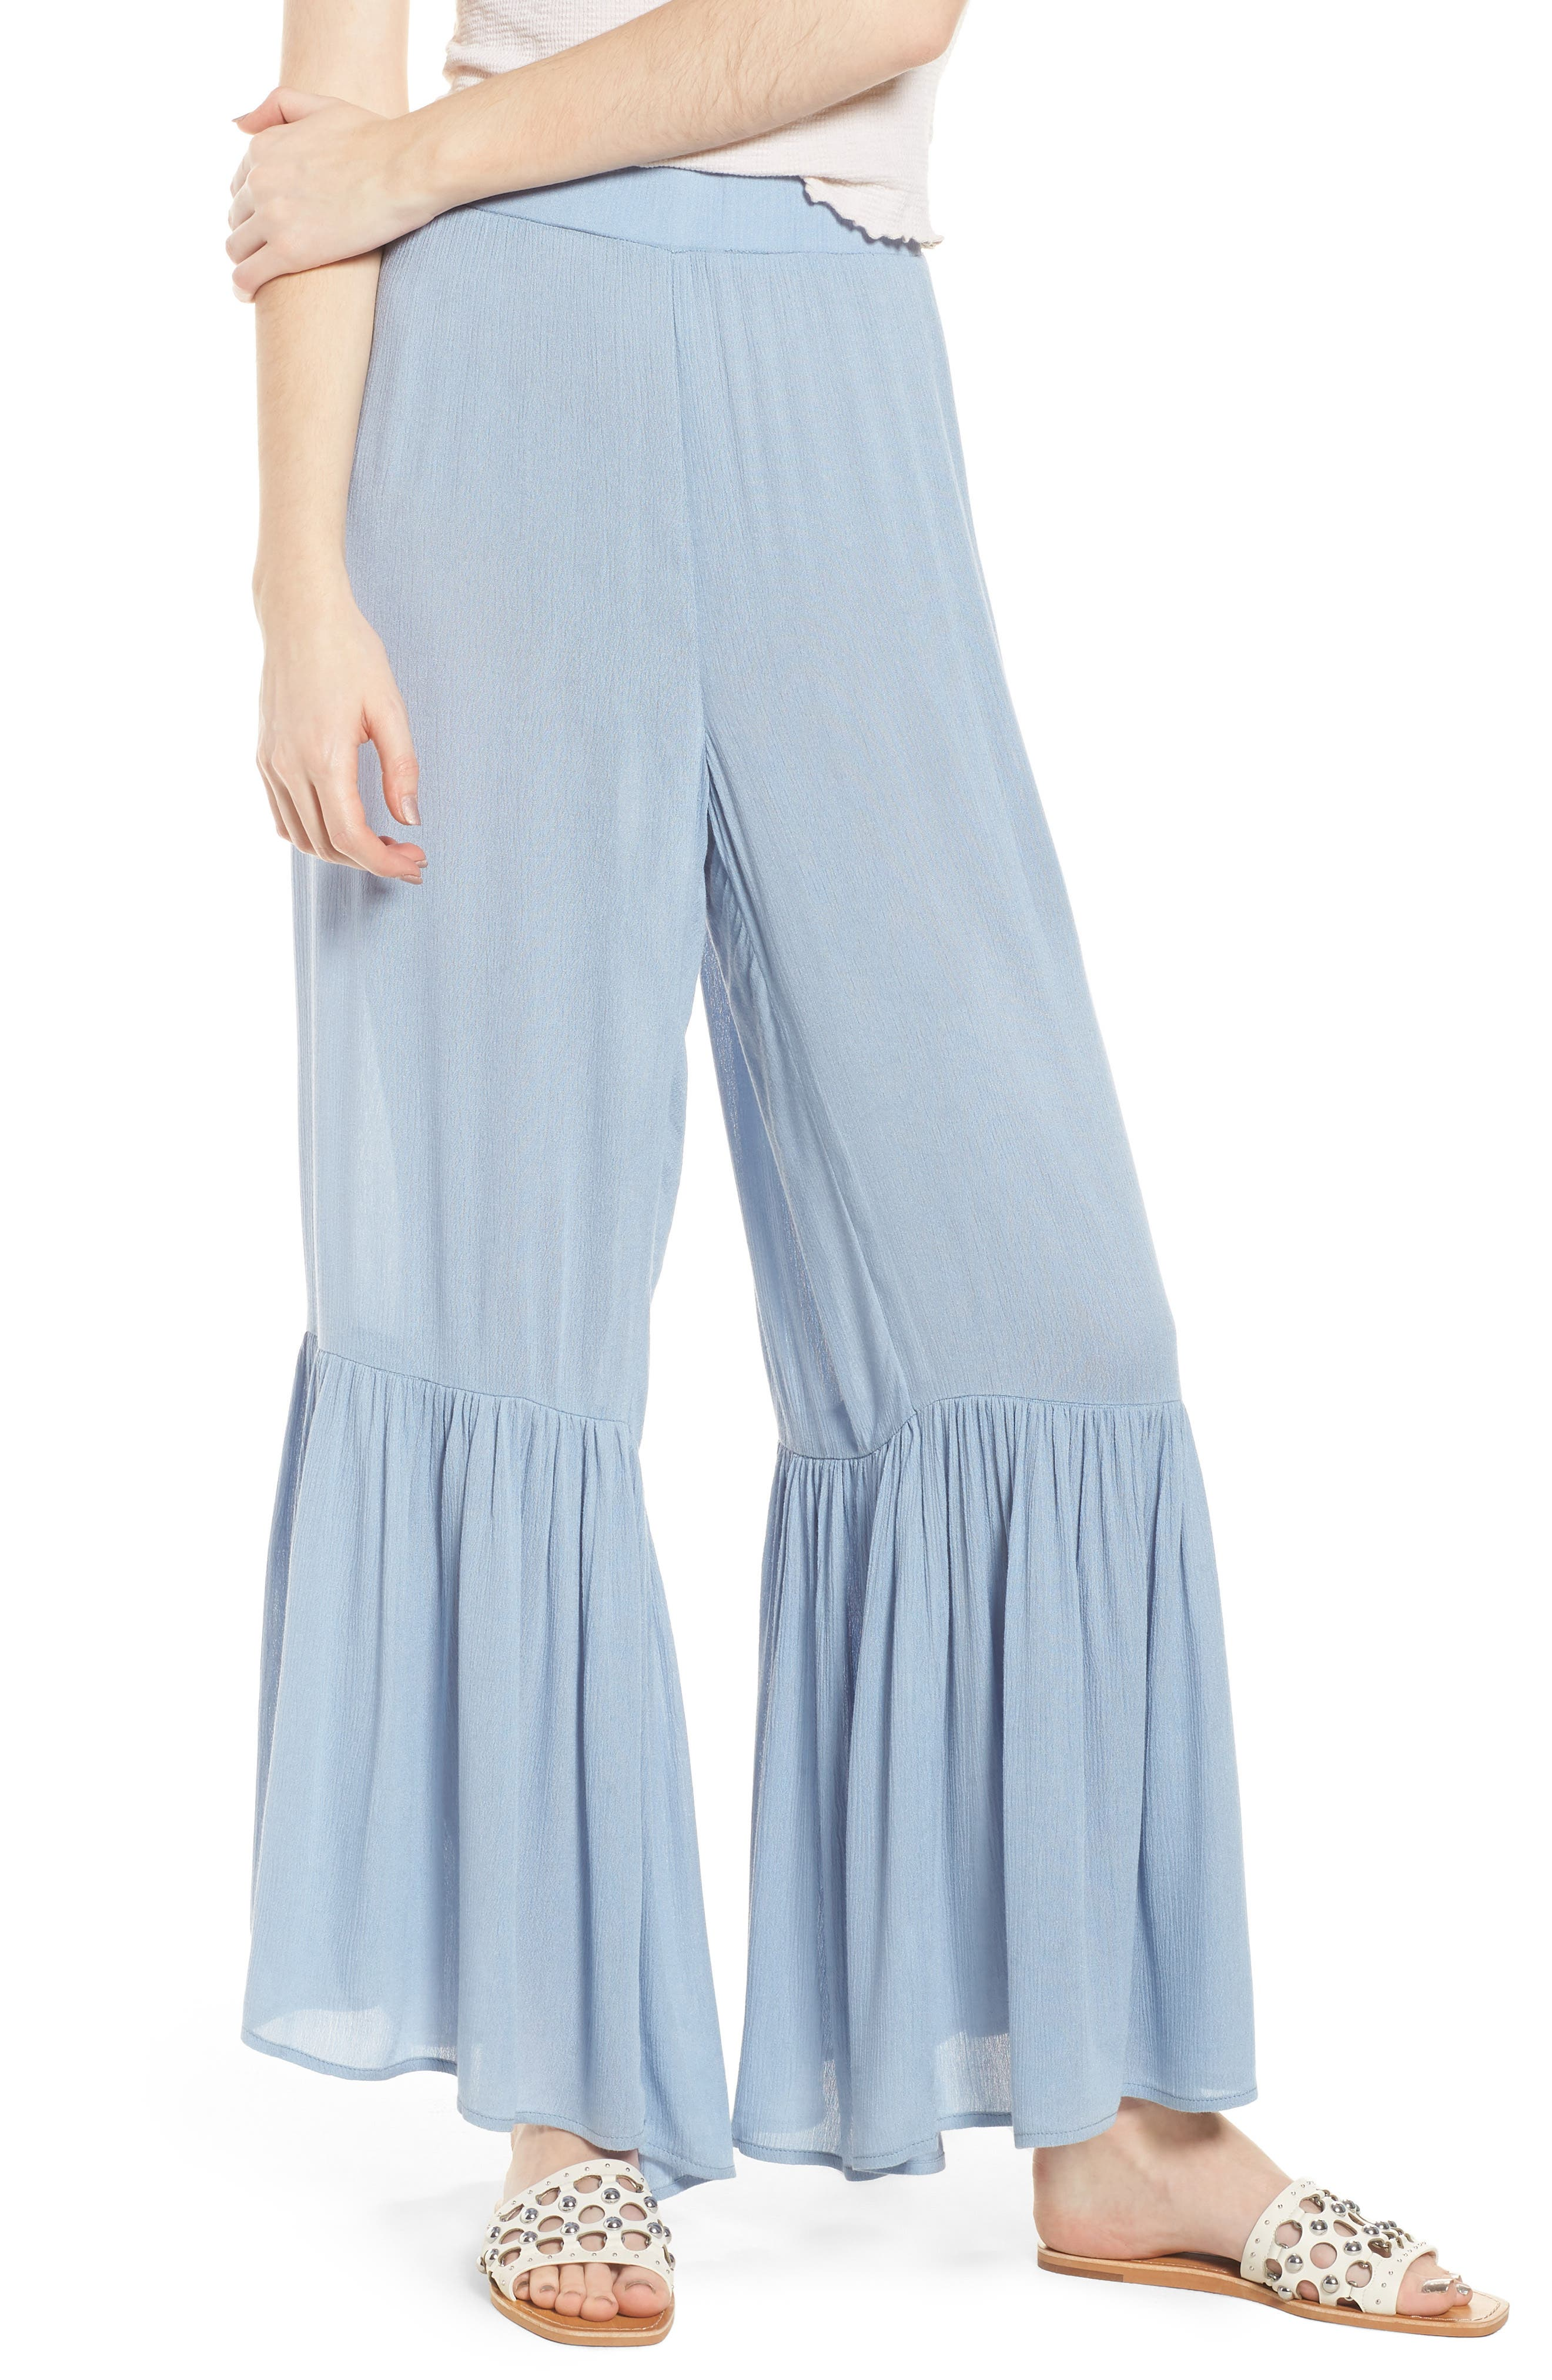 Mystique Ruffle Hem Beach Pants,                         Main,                         color, 400